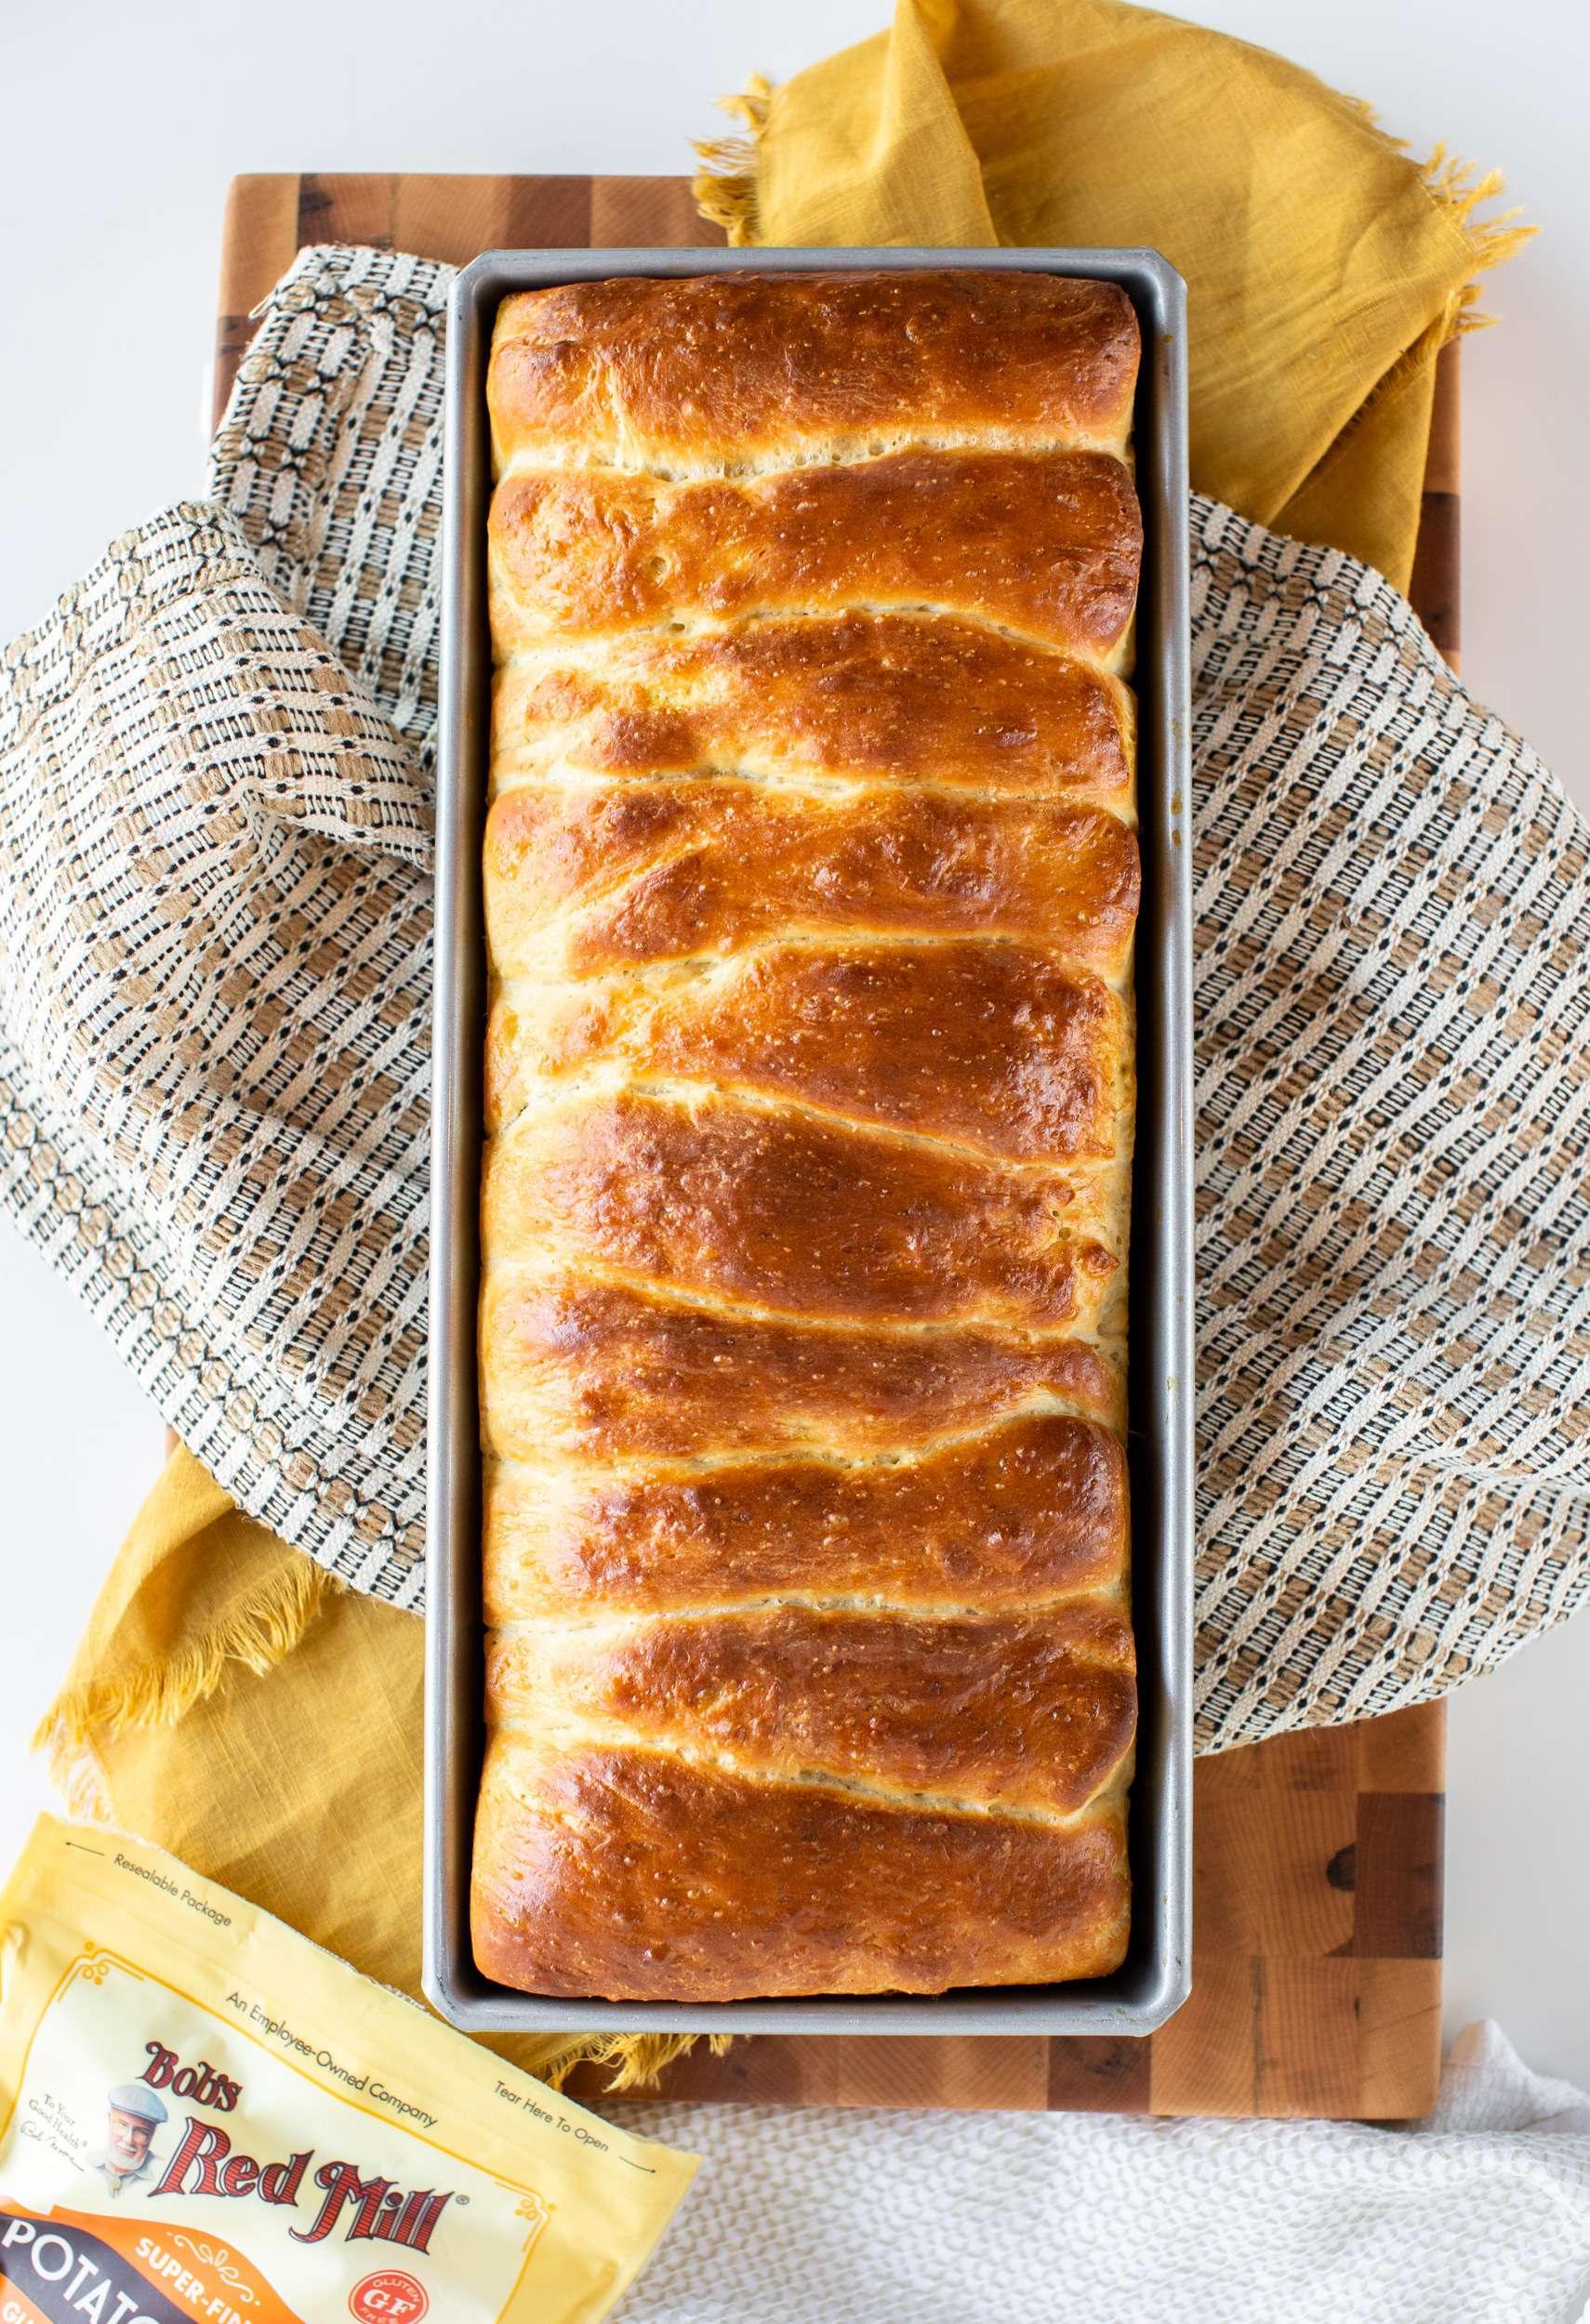 New England Style Rolls (hot dog buns)